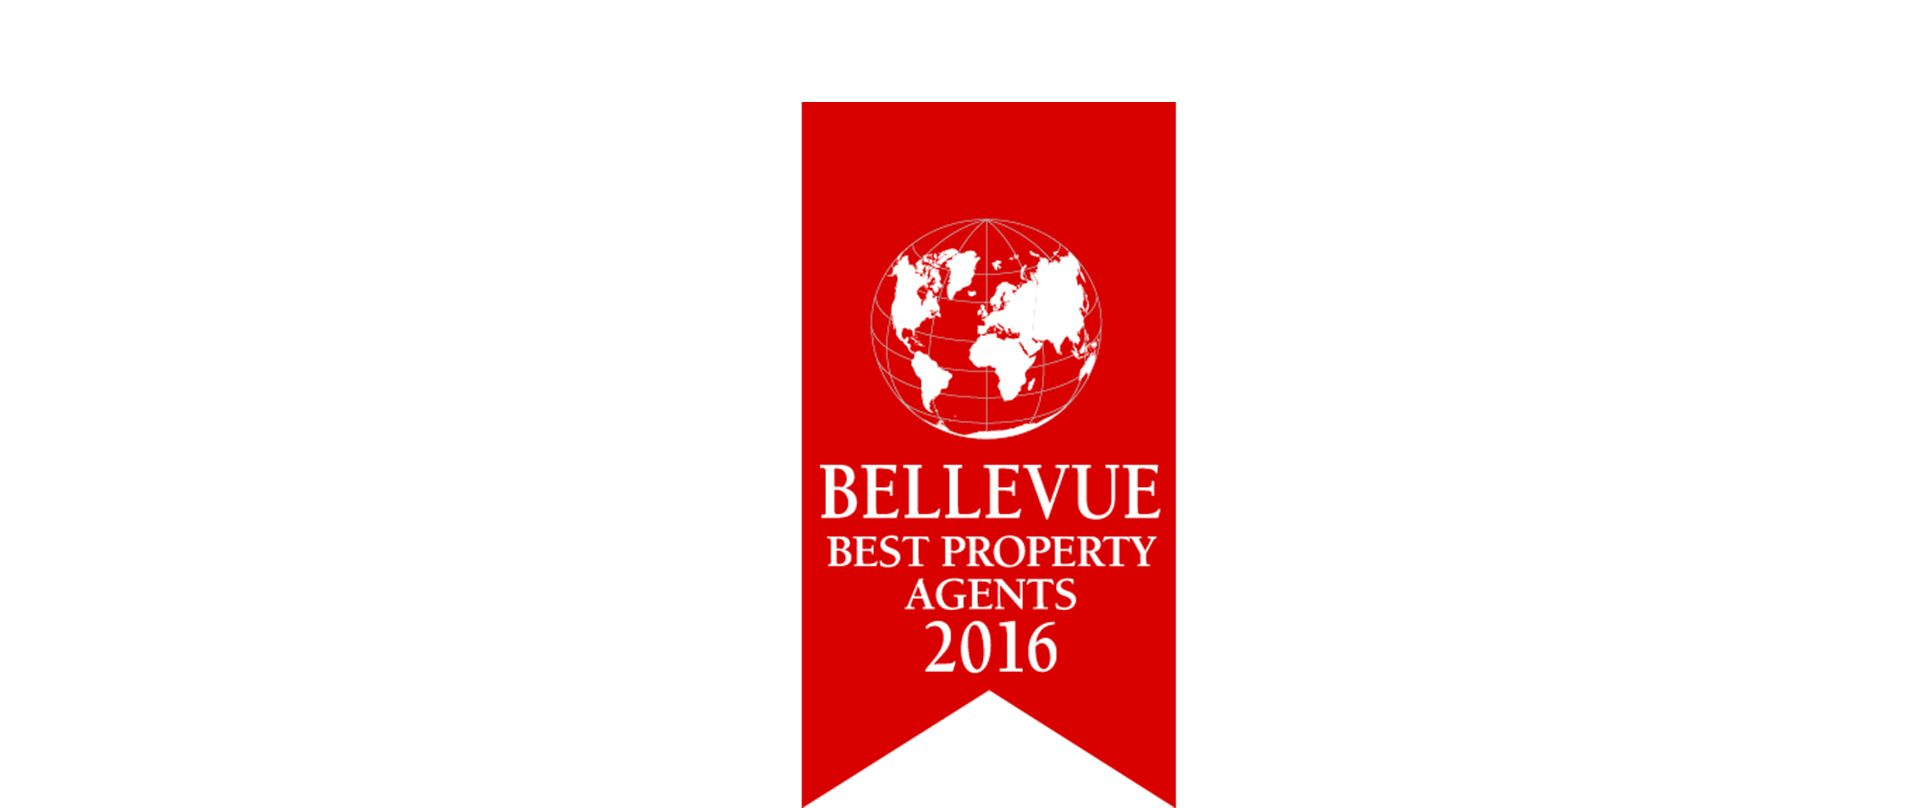 bellevue certificate nevado realty